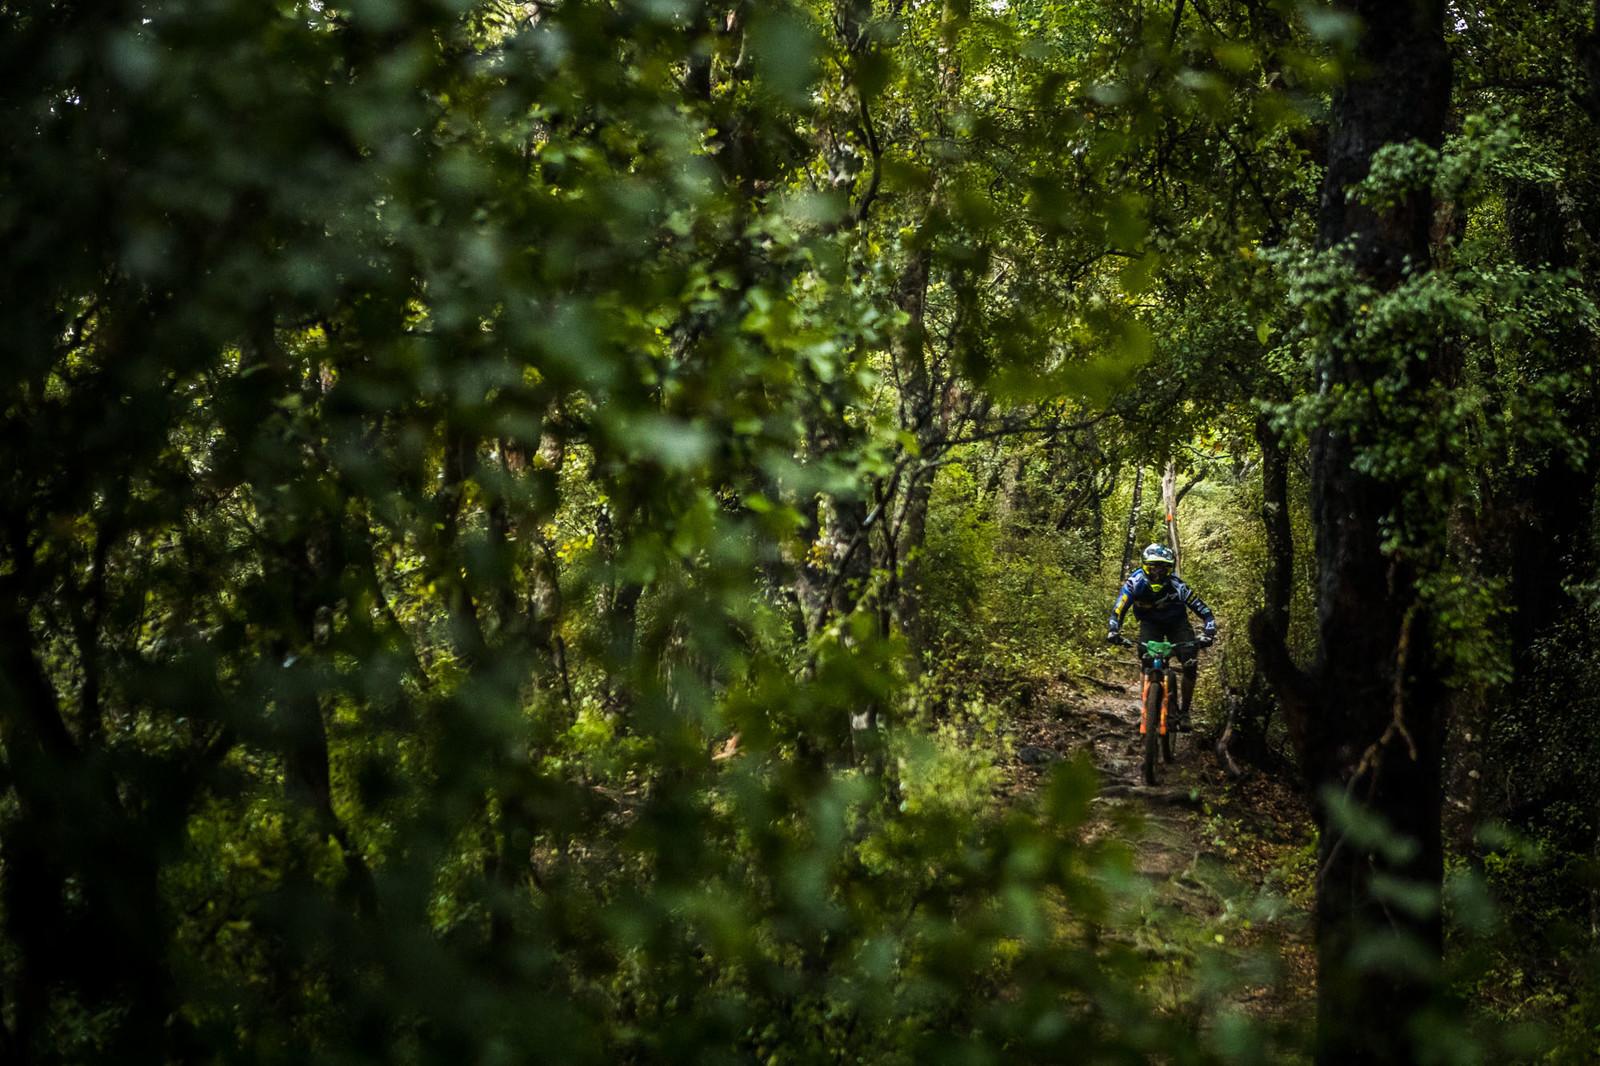 NZEnduro19 BB AS6I0101 - 2019 NZ Enduro Day 1 Photo Gallery - Mountain Biking Pictures - Vital MTB